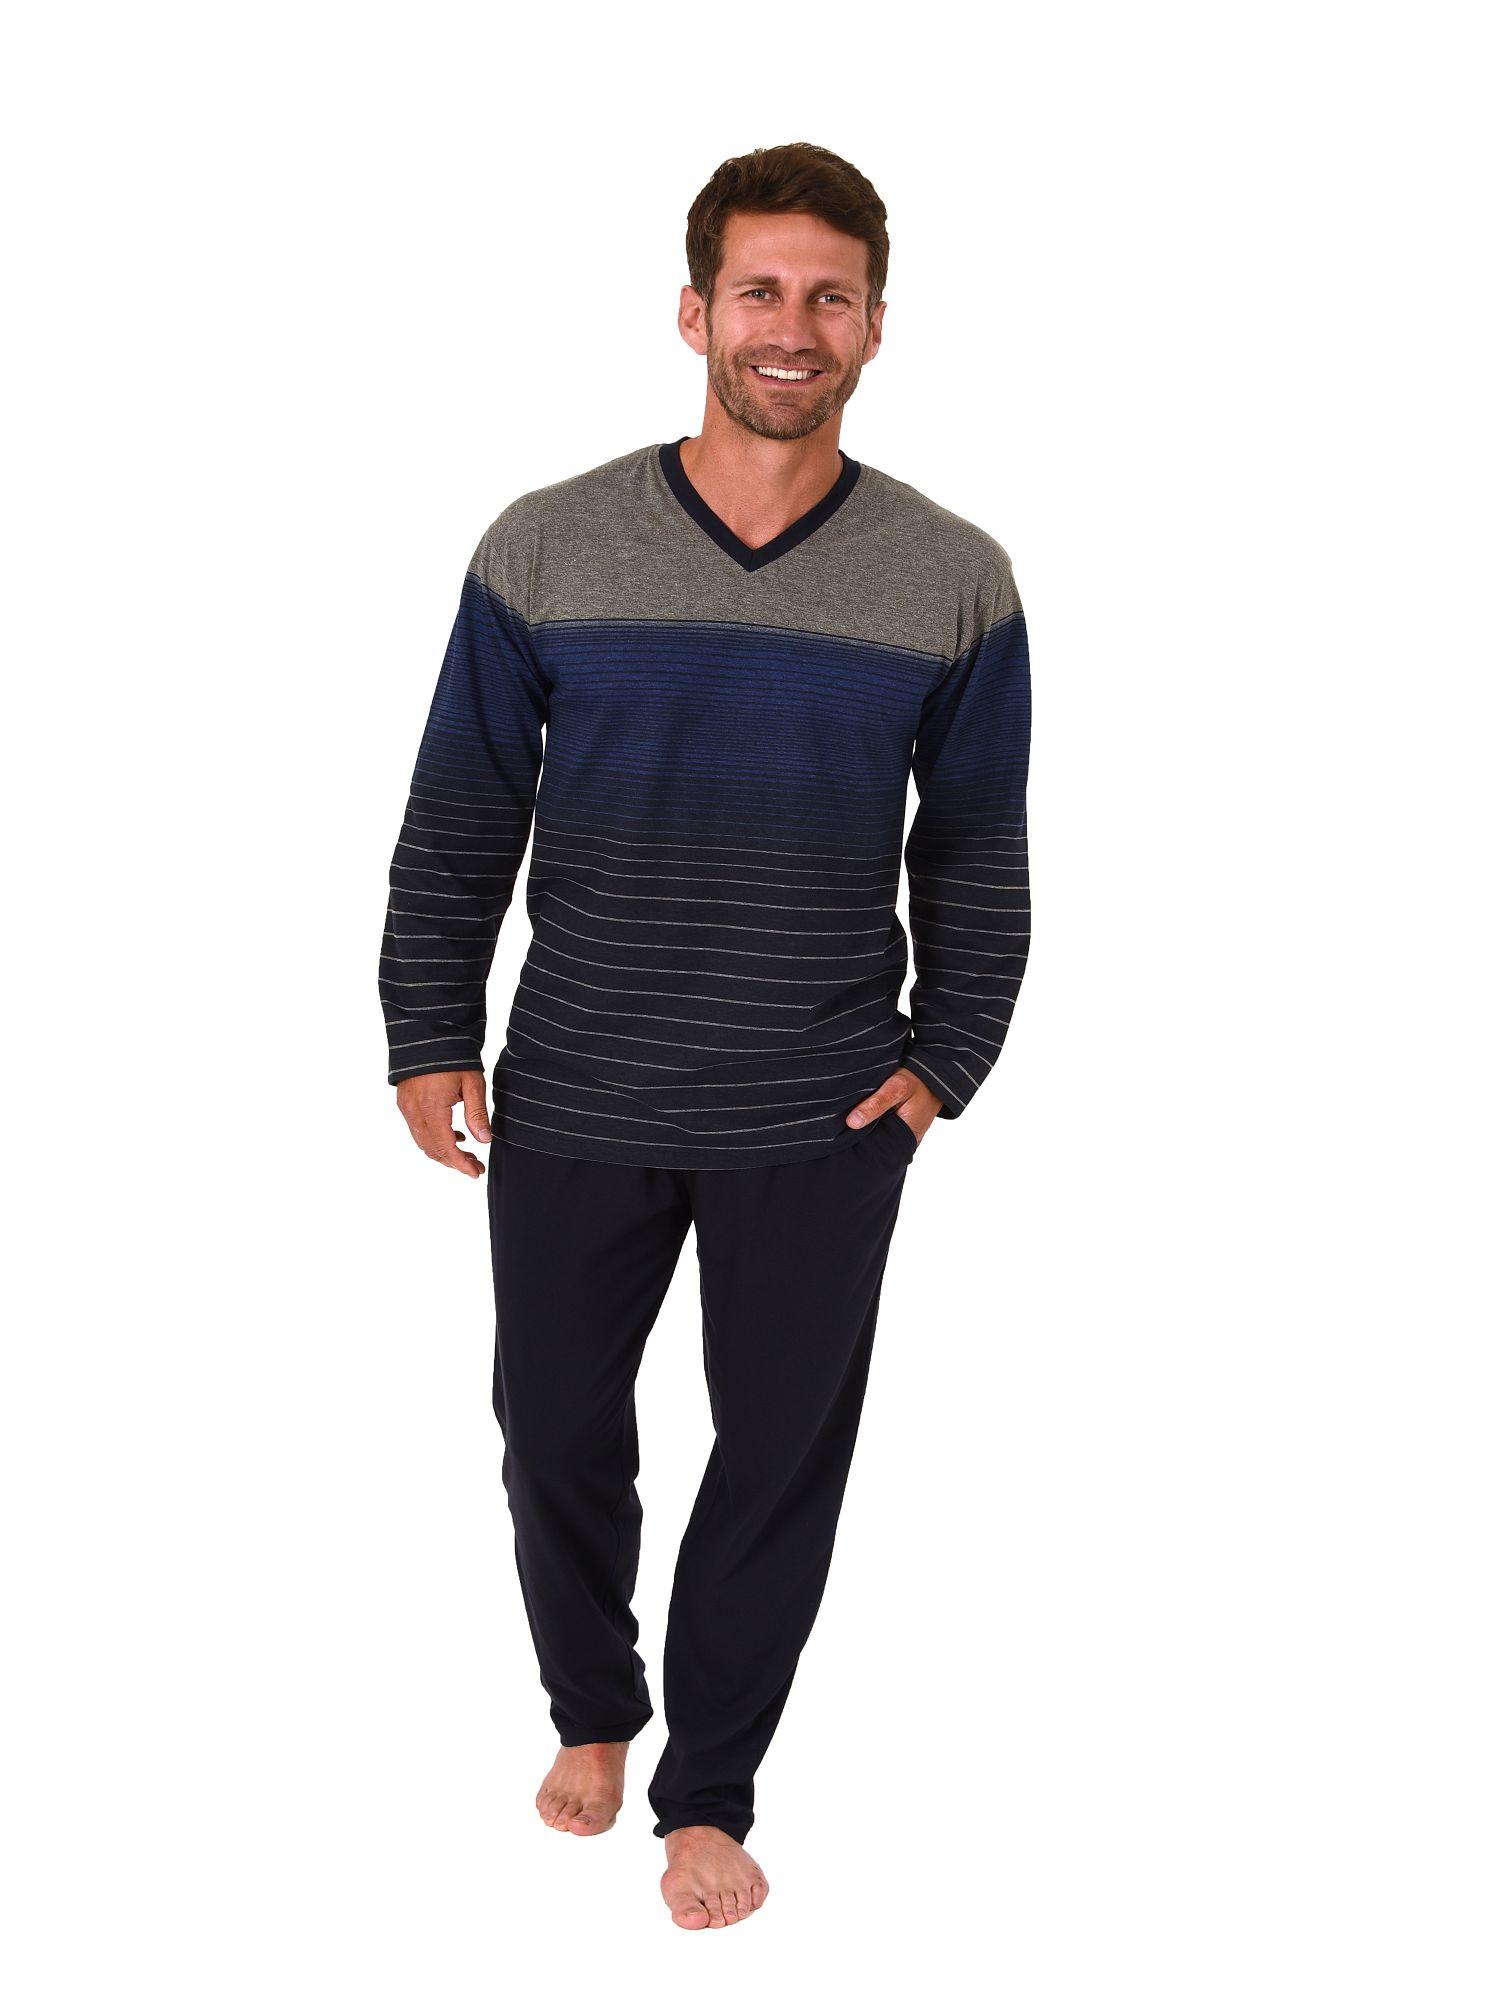 Eleganter Herren Pyjama Schlafanzug langarm in  Streifen Optik – 181 101 90 003